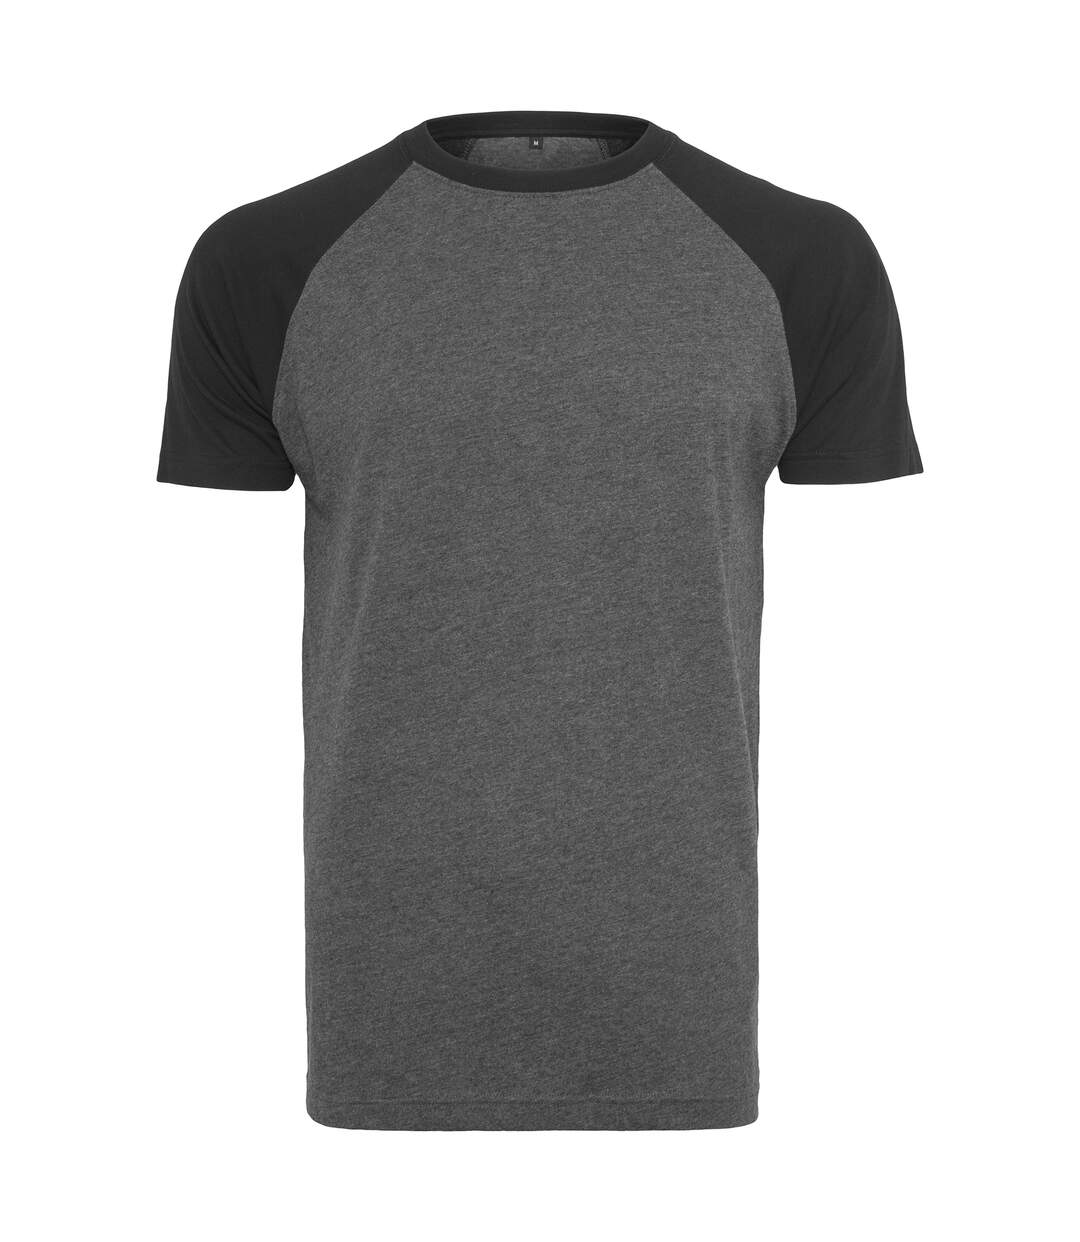 Build Your Brand Mens Raglan Contrast Tee (Charcoal/Black) - UTRW5817